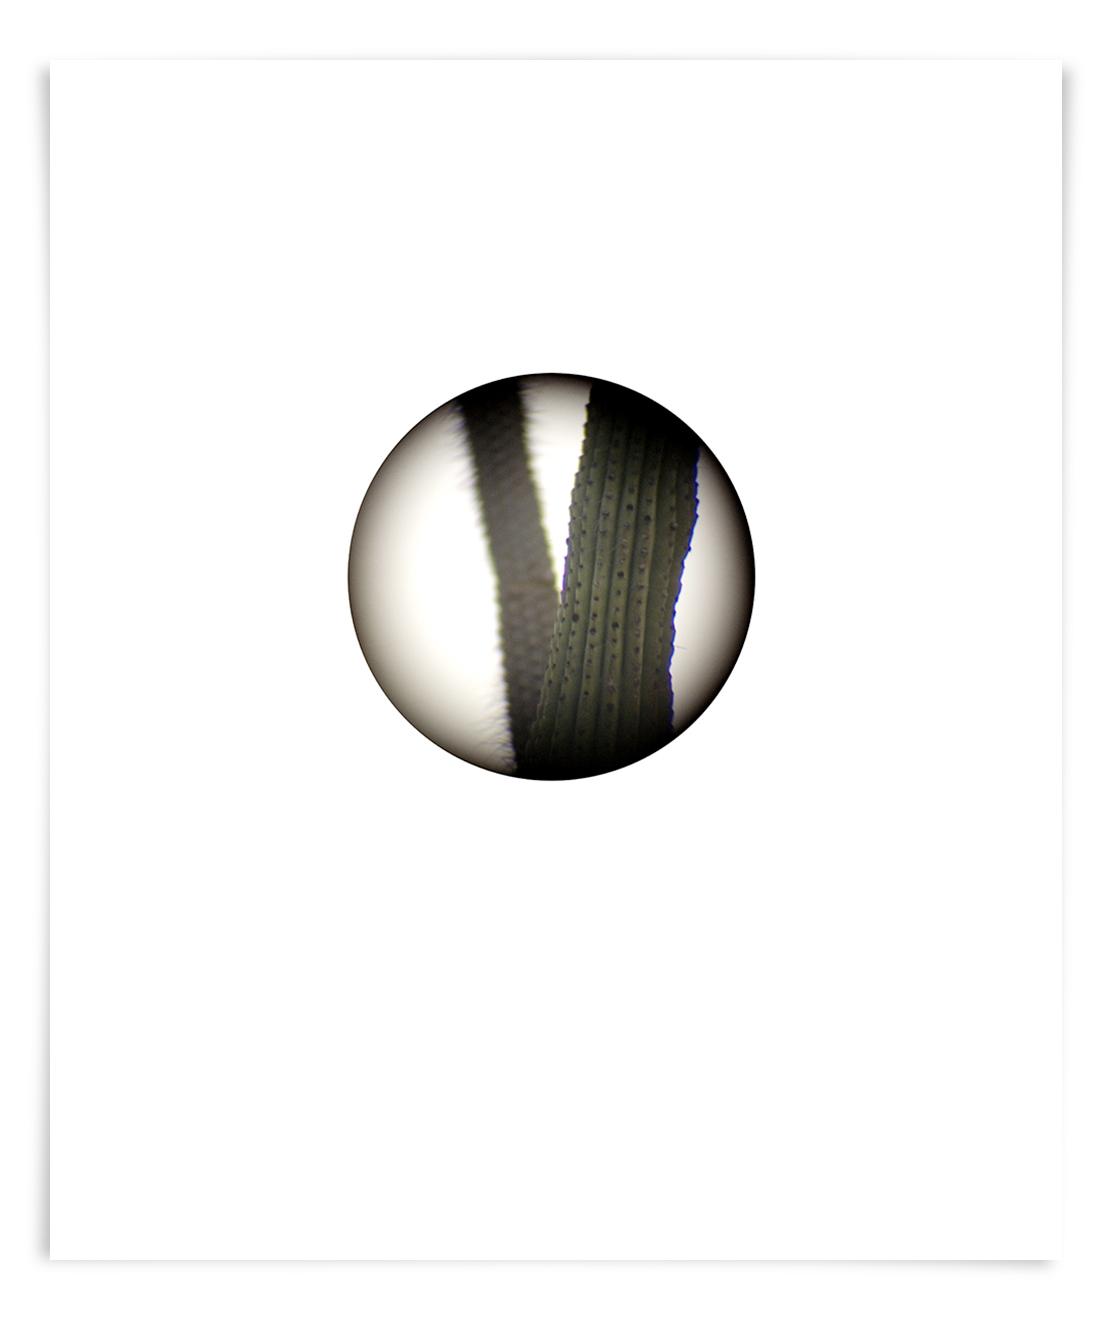 The Black Mountain Organ Pipe (ST01 090911)   24 x 18 in (61 x 46 cm)